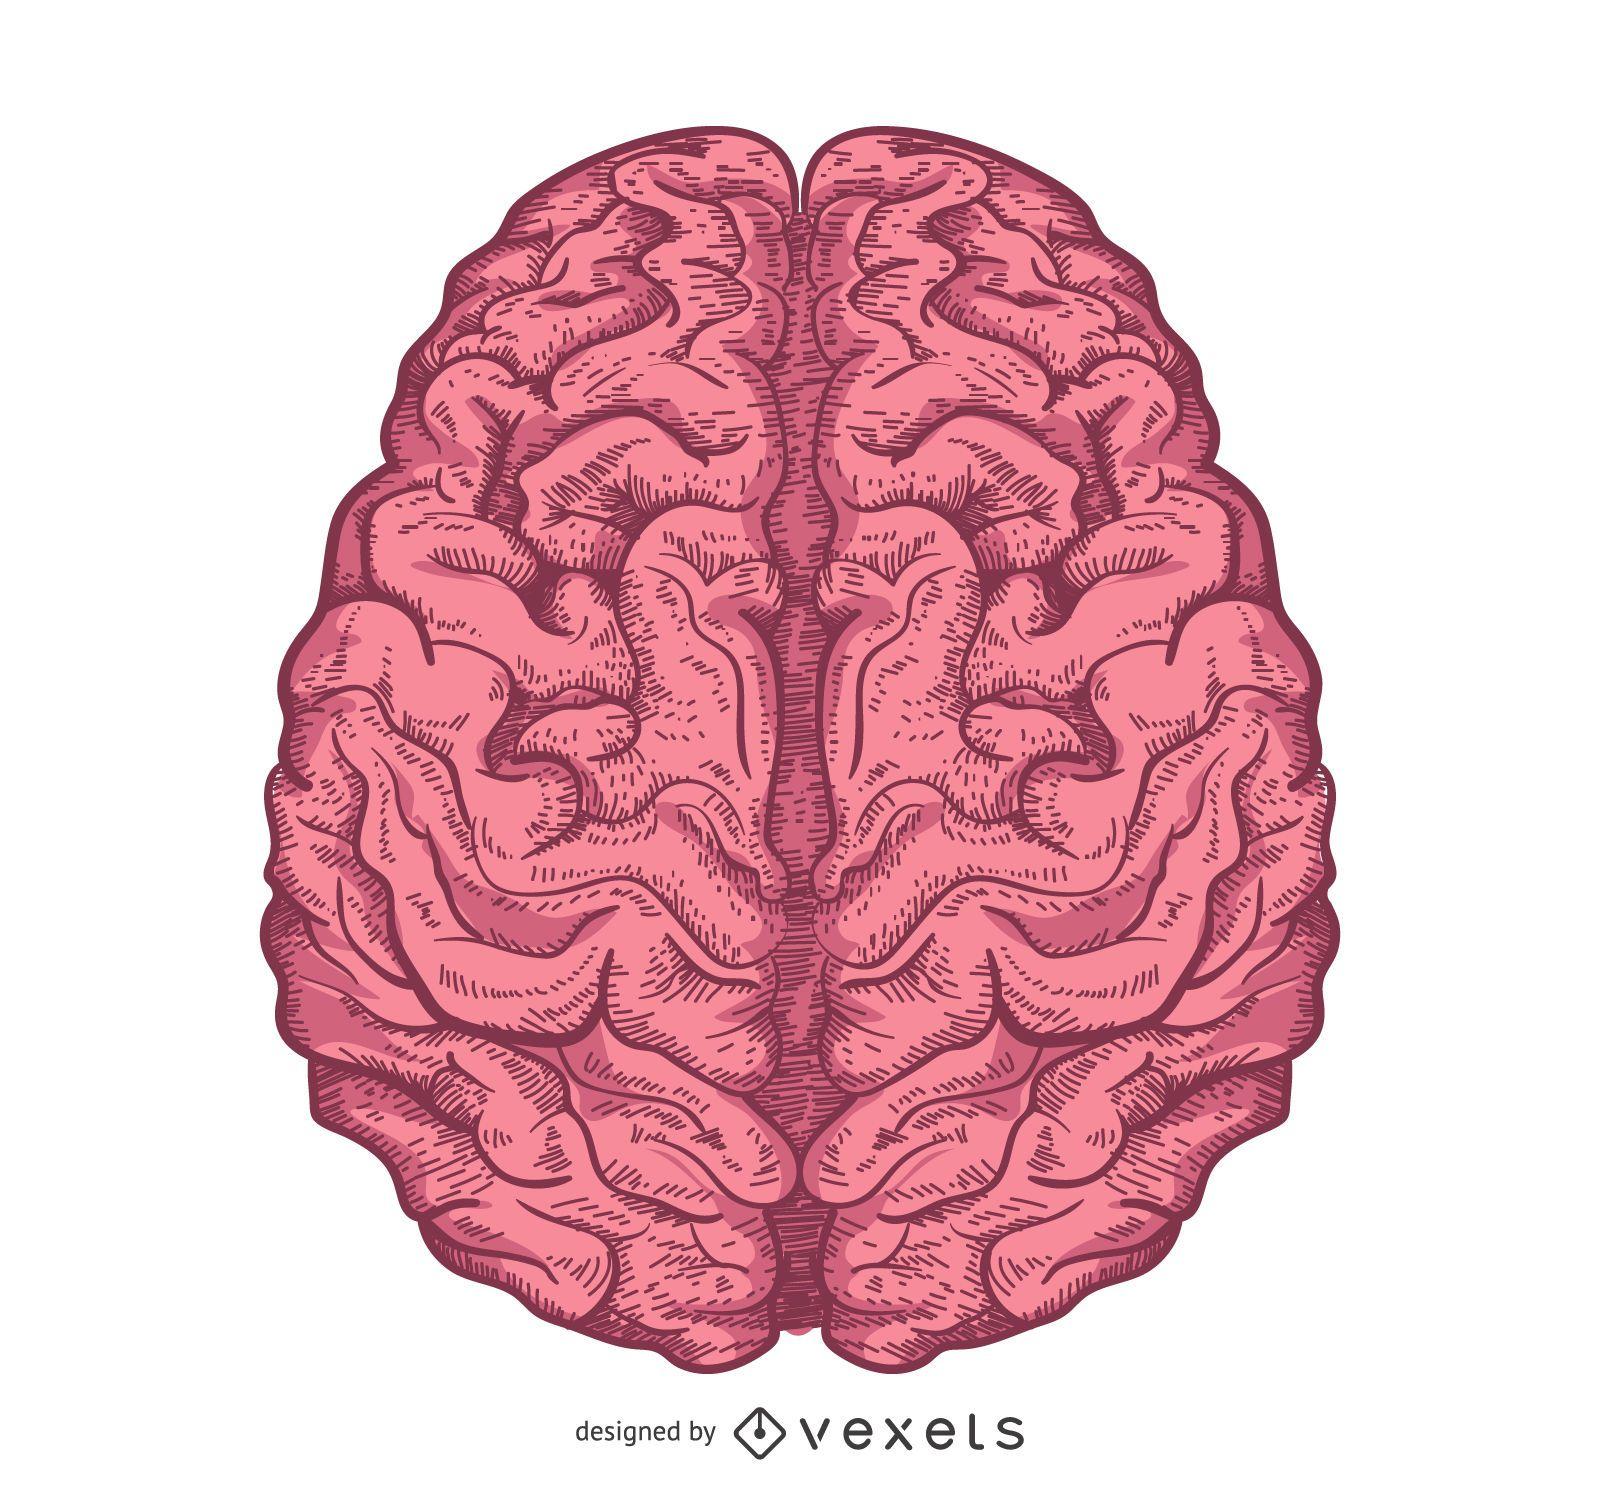 Illustrated brain design isolated